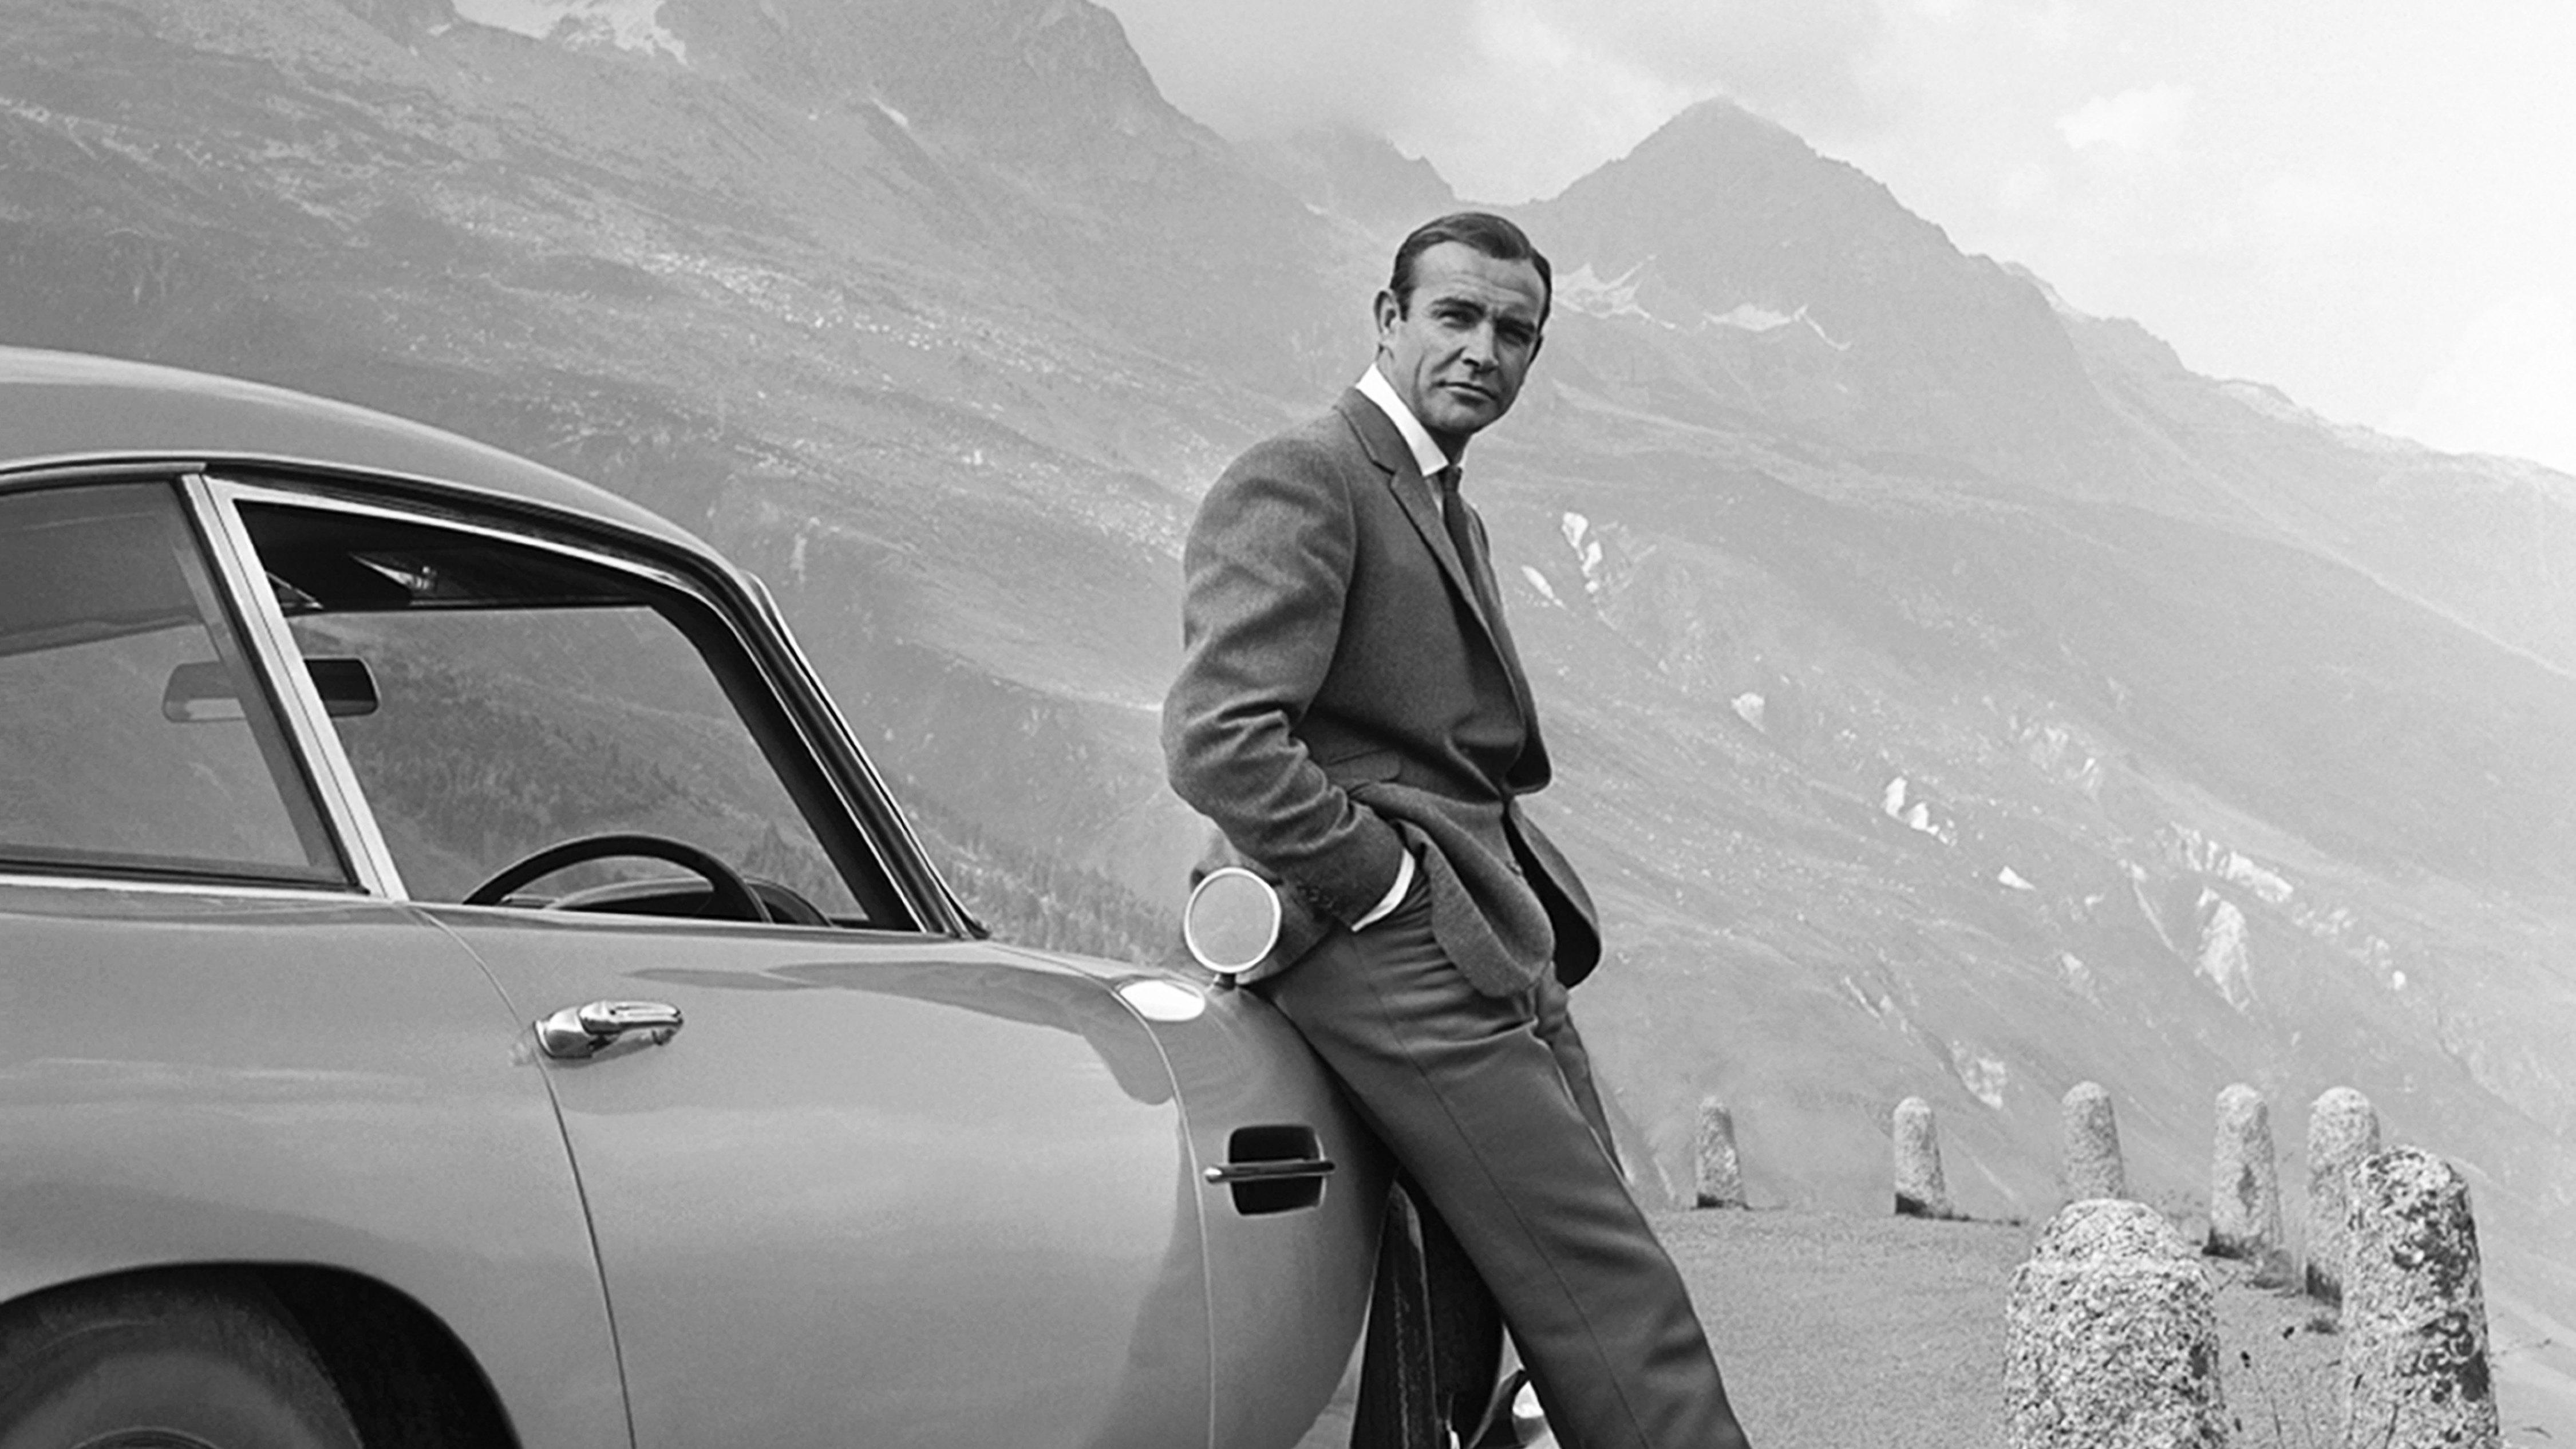 gettyimages 1080440374 wide a3f07ba3712060f40e71e8158e8bda652039f4a7 Daniel Craig Voted Best James Bond In Twitter Poll